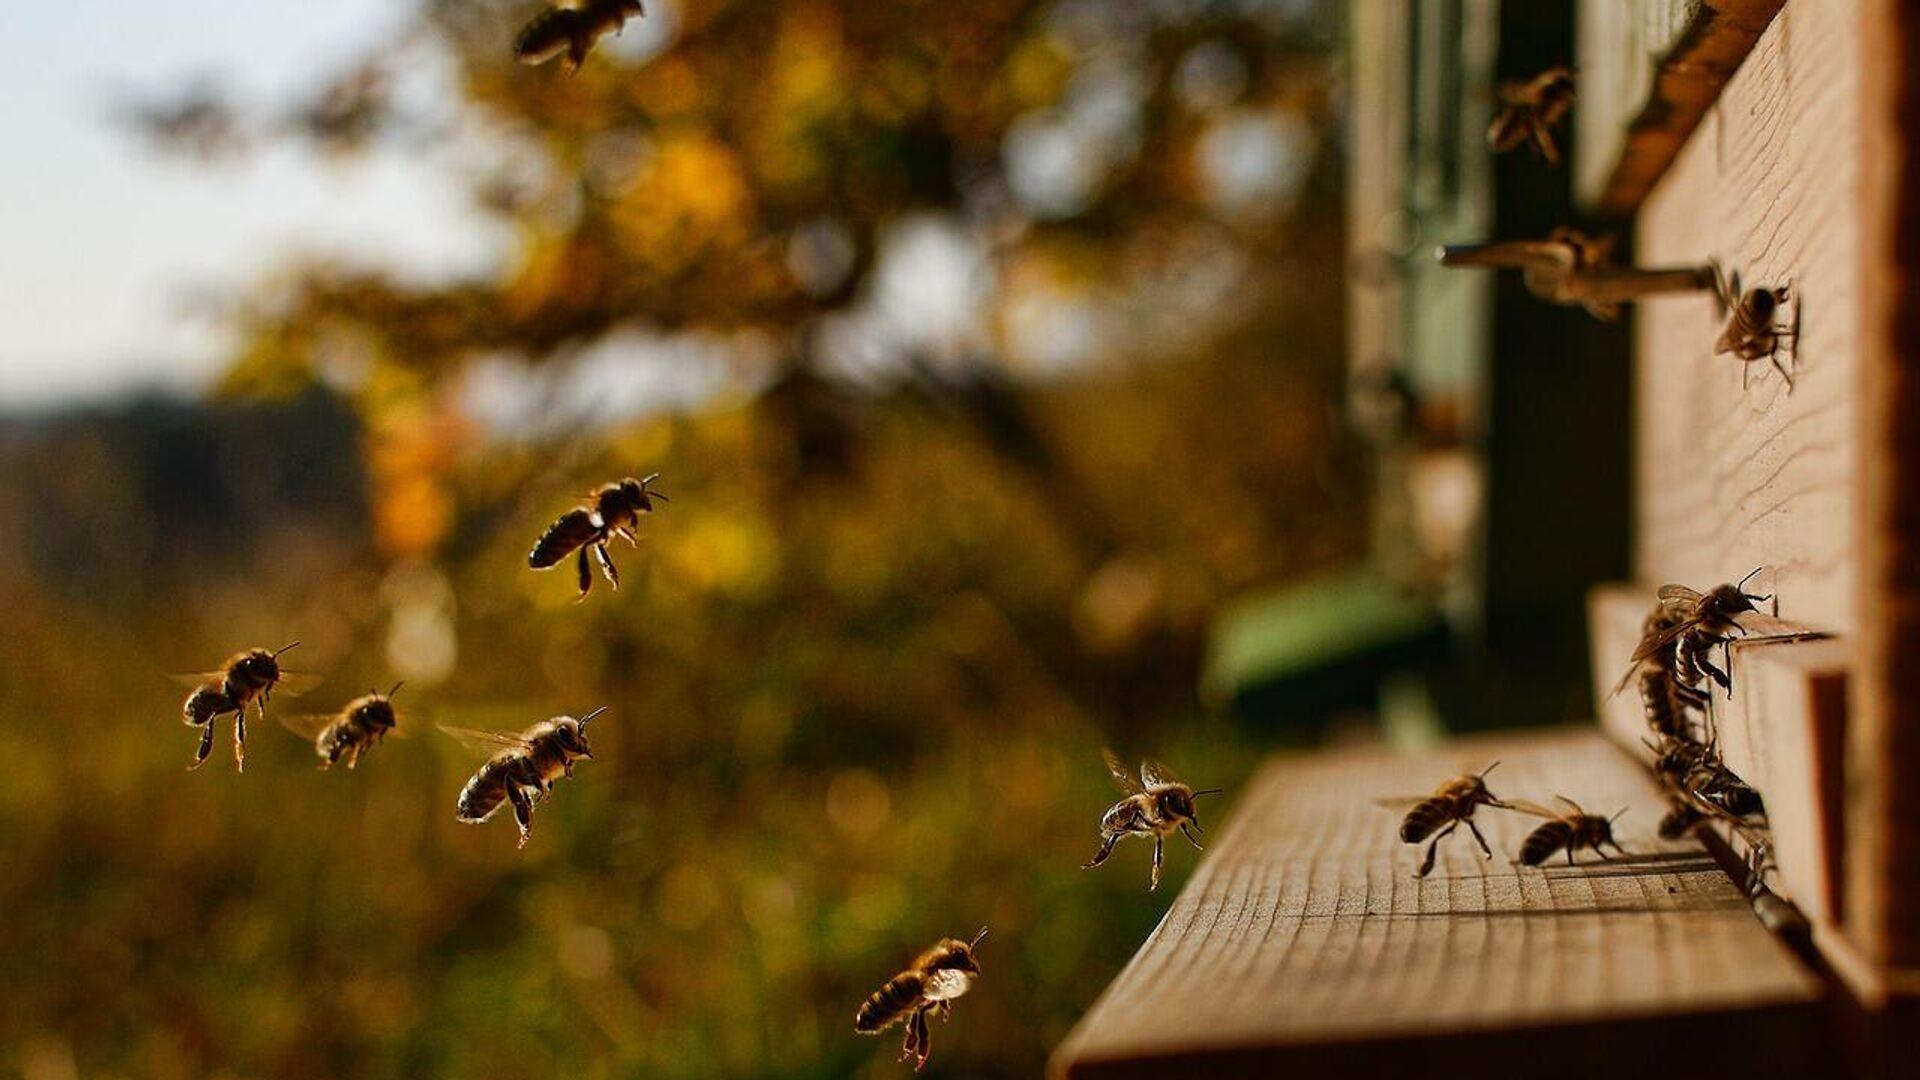 Honigbienen (Symbolbild)  - SNA, 1920, 05.08.2021